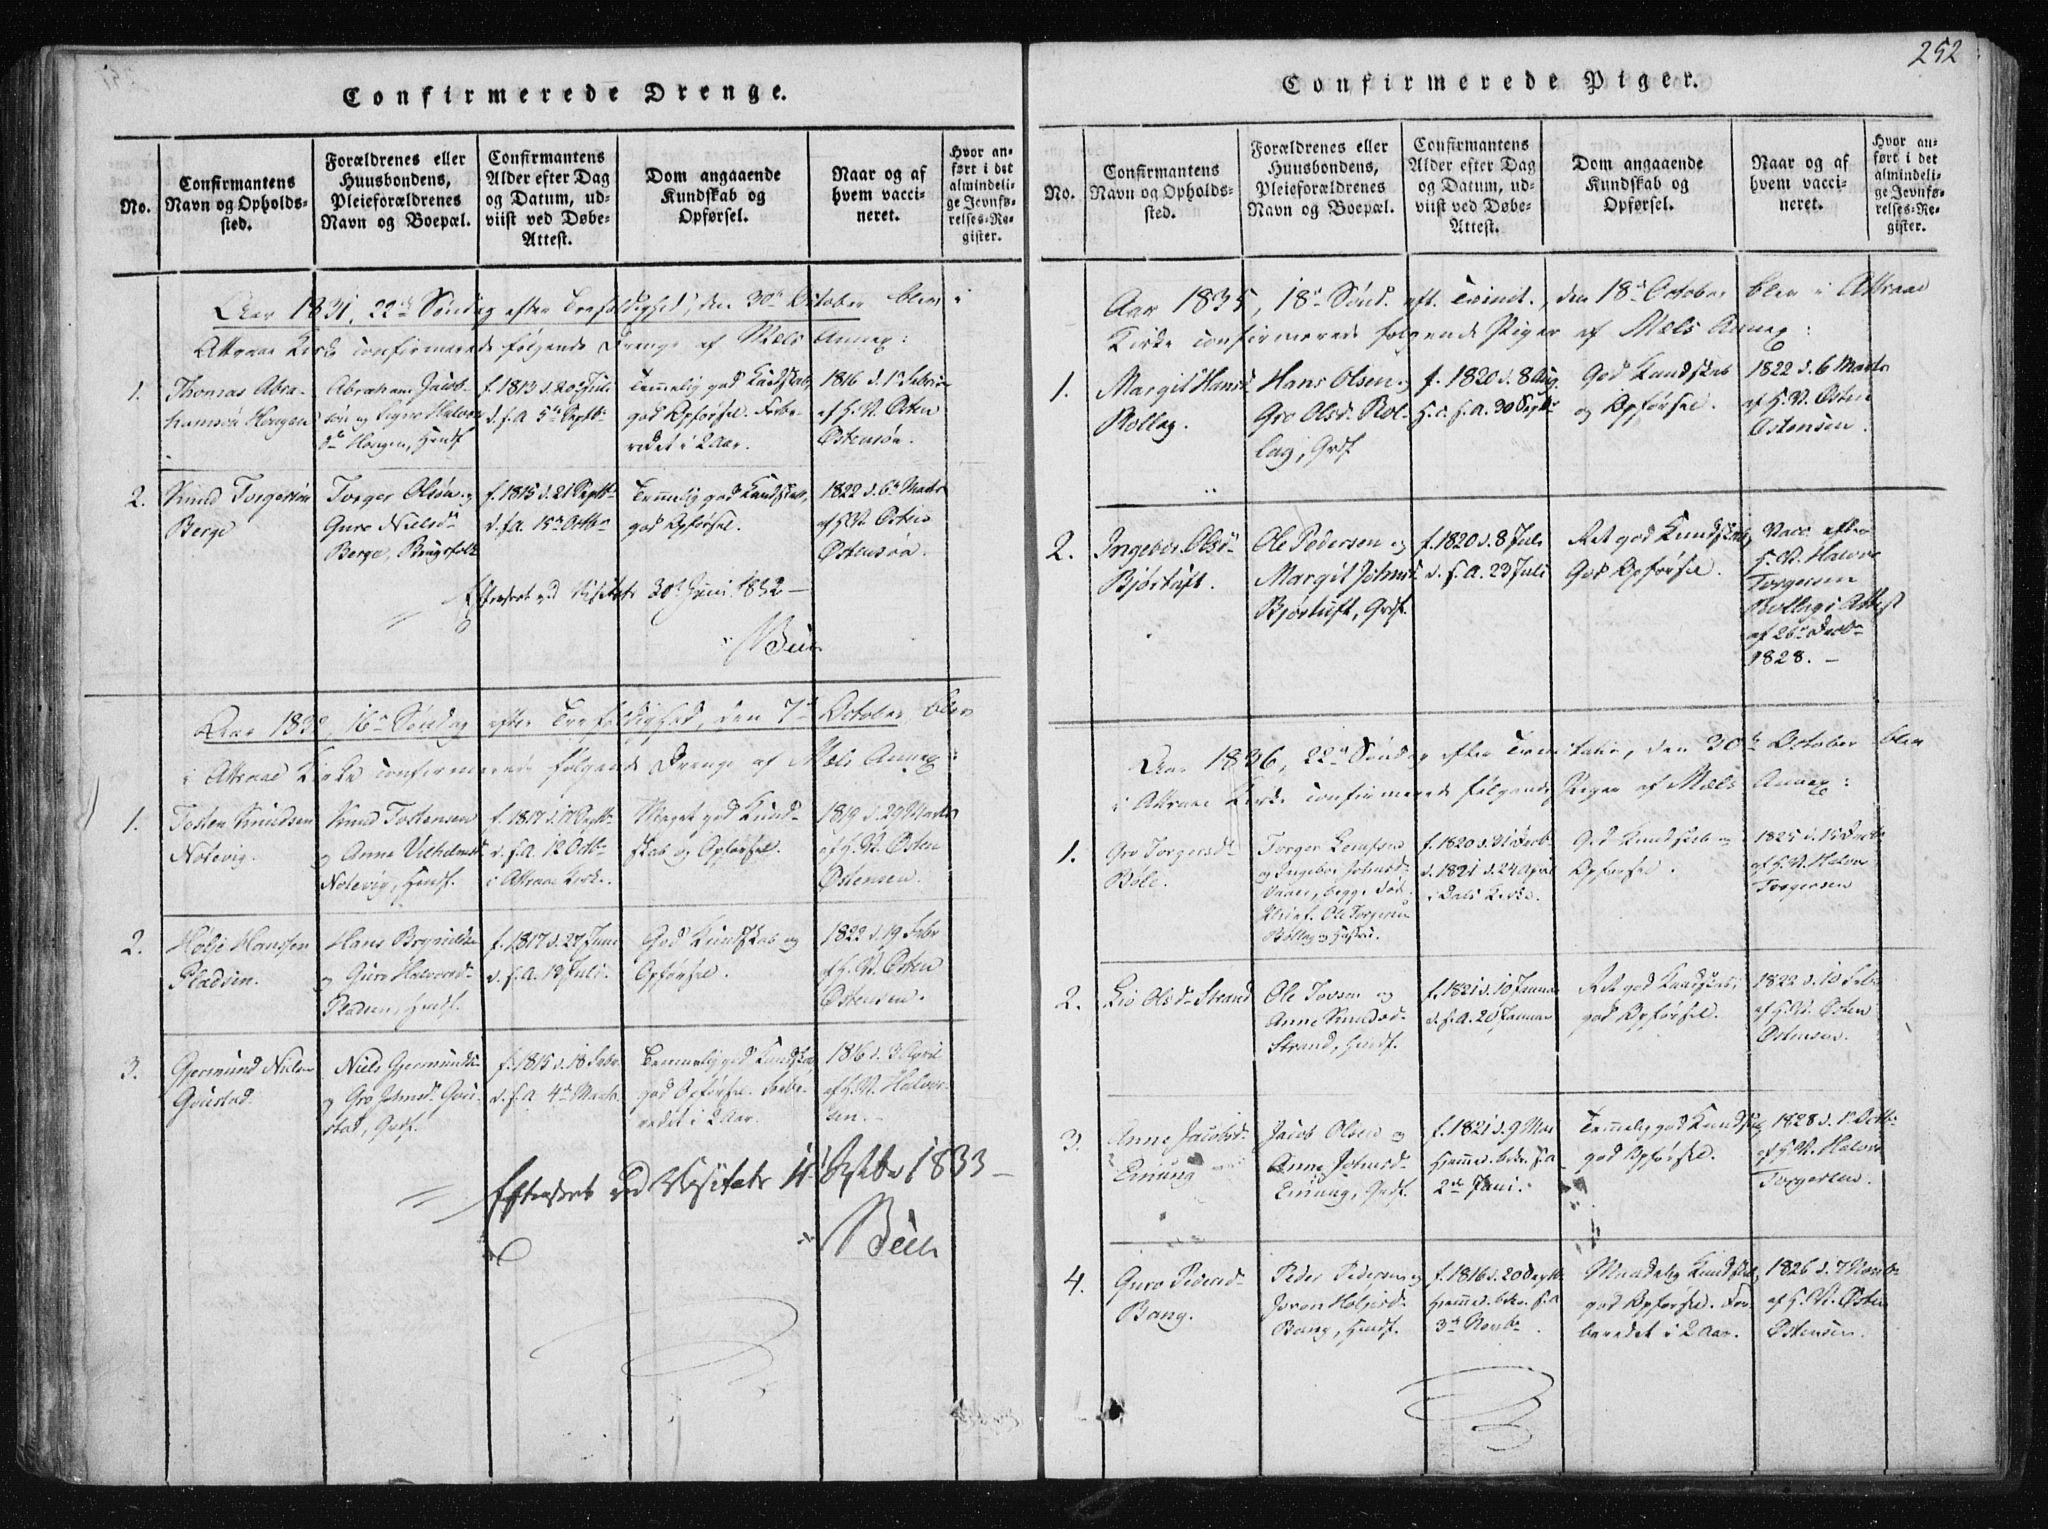 SAKO, Tinn kirkebøker, F/Fb/L0001: Ministerialbok nr. II 1, 1815-1843, s. 252